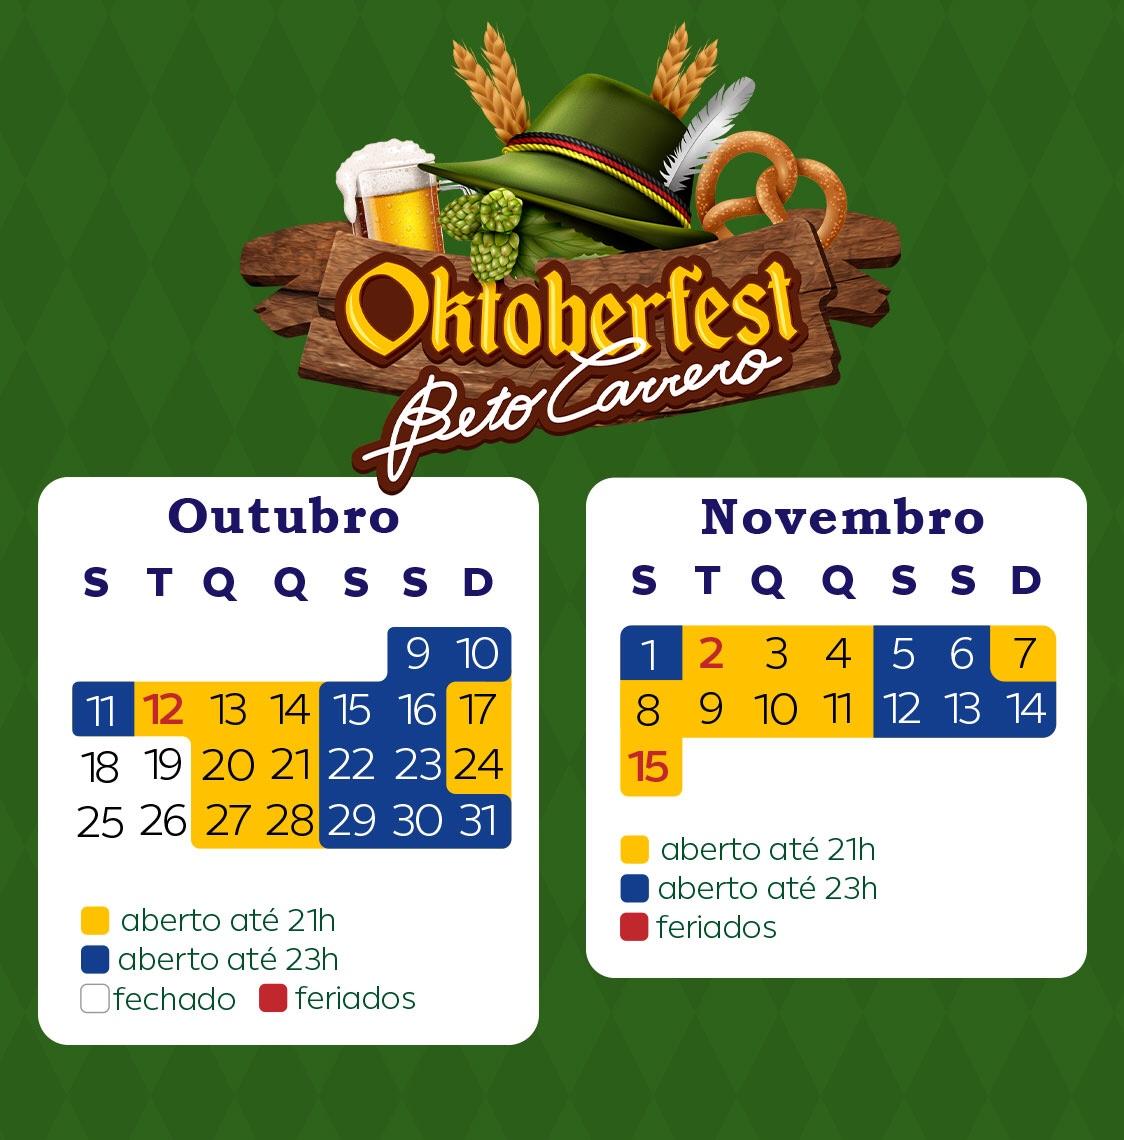 Fritz prepara o traje, veeem aí: Oktoberfest Beto Carrero!